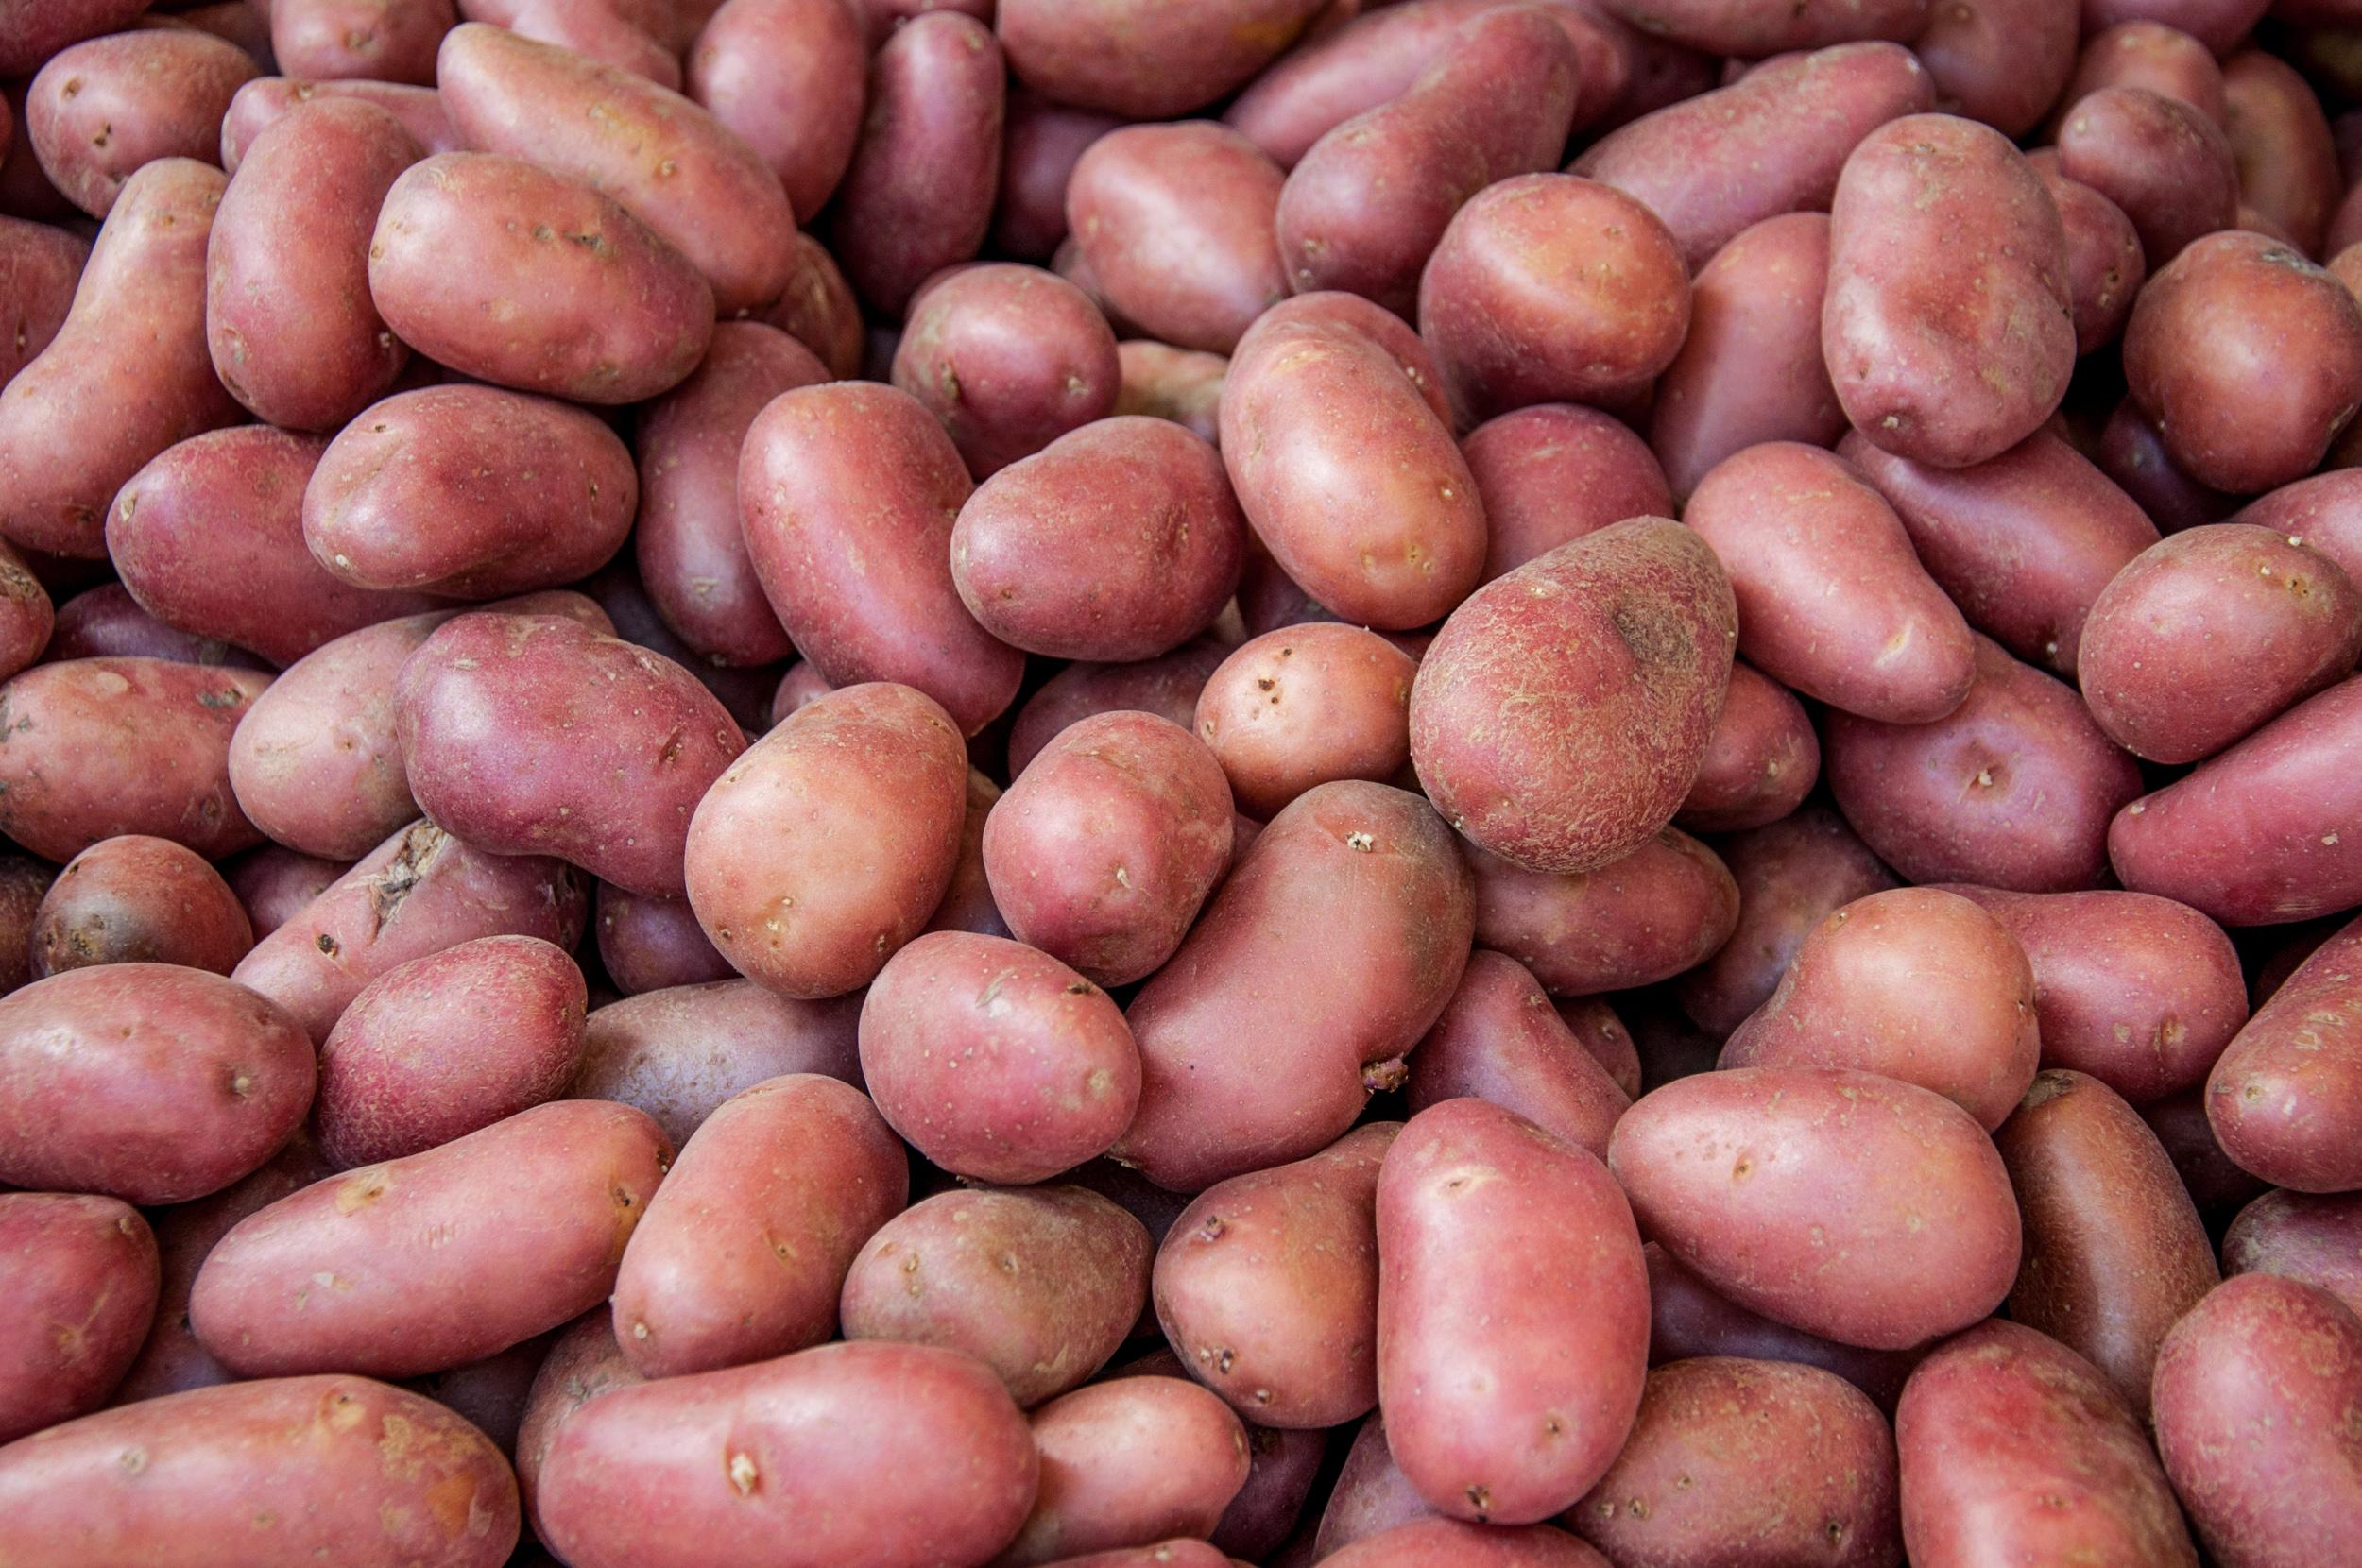 Organic red potato pile sold on market photo